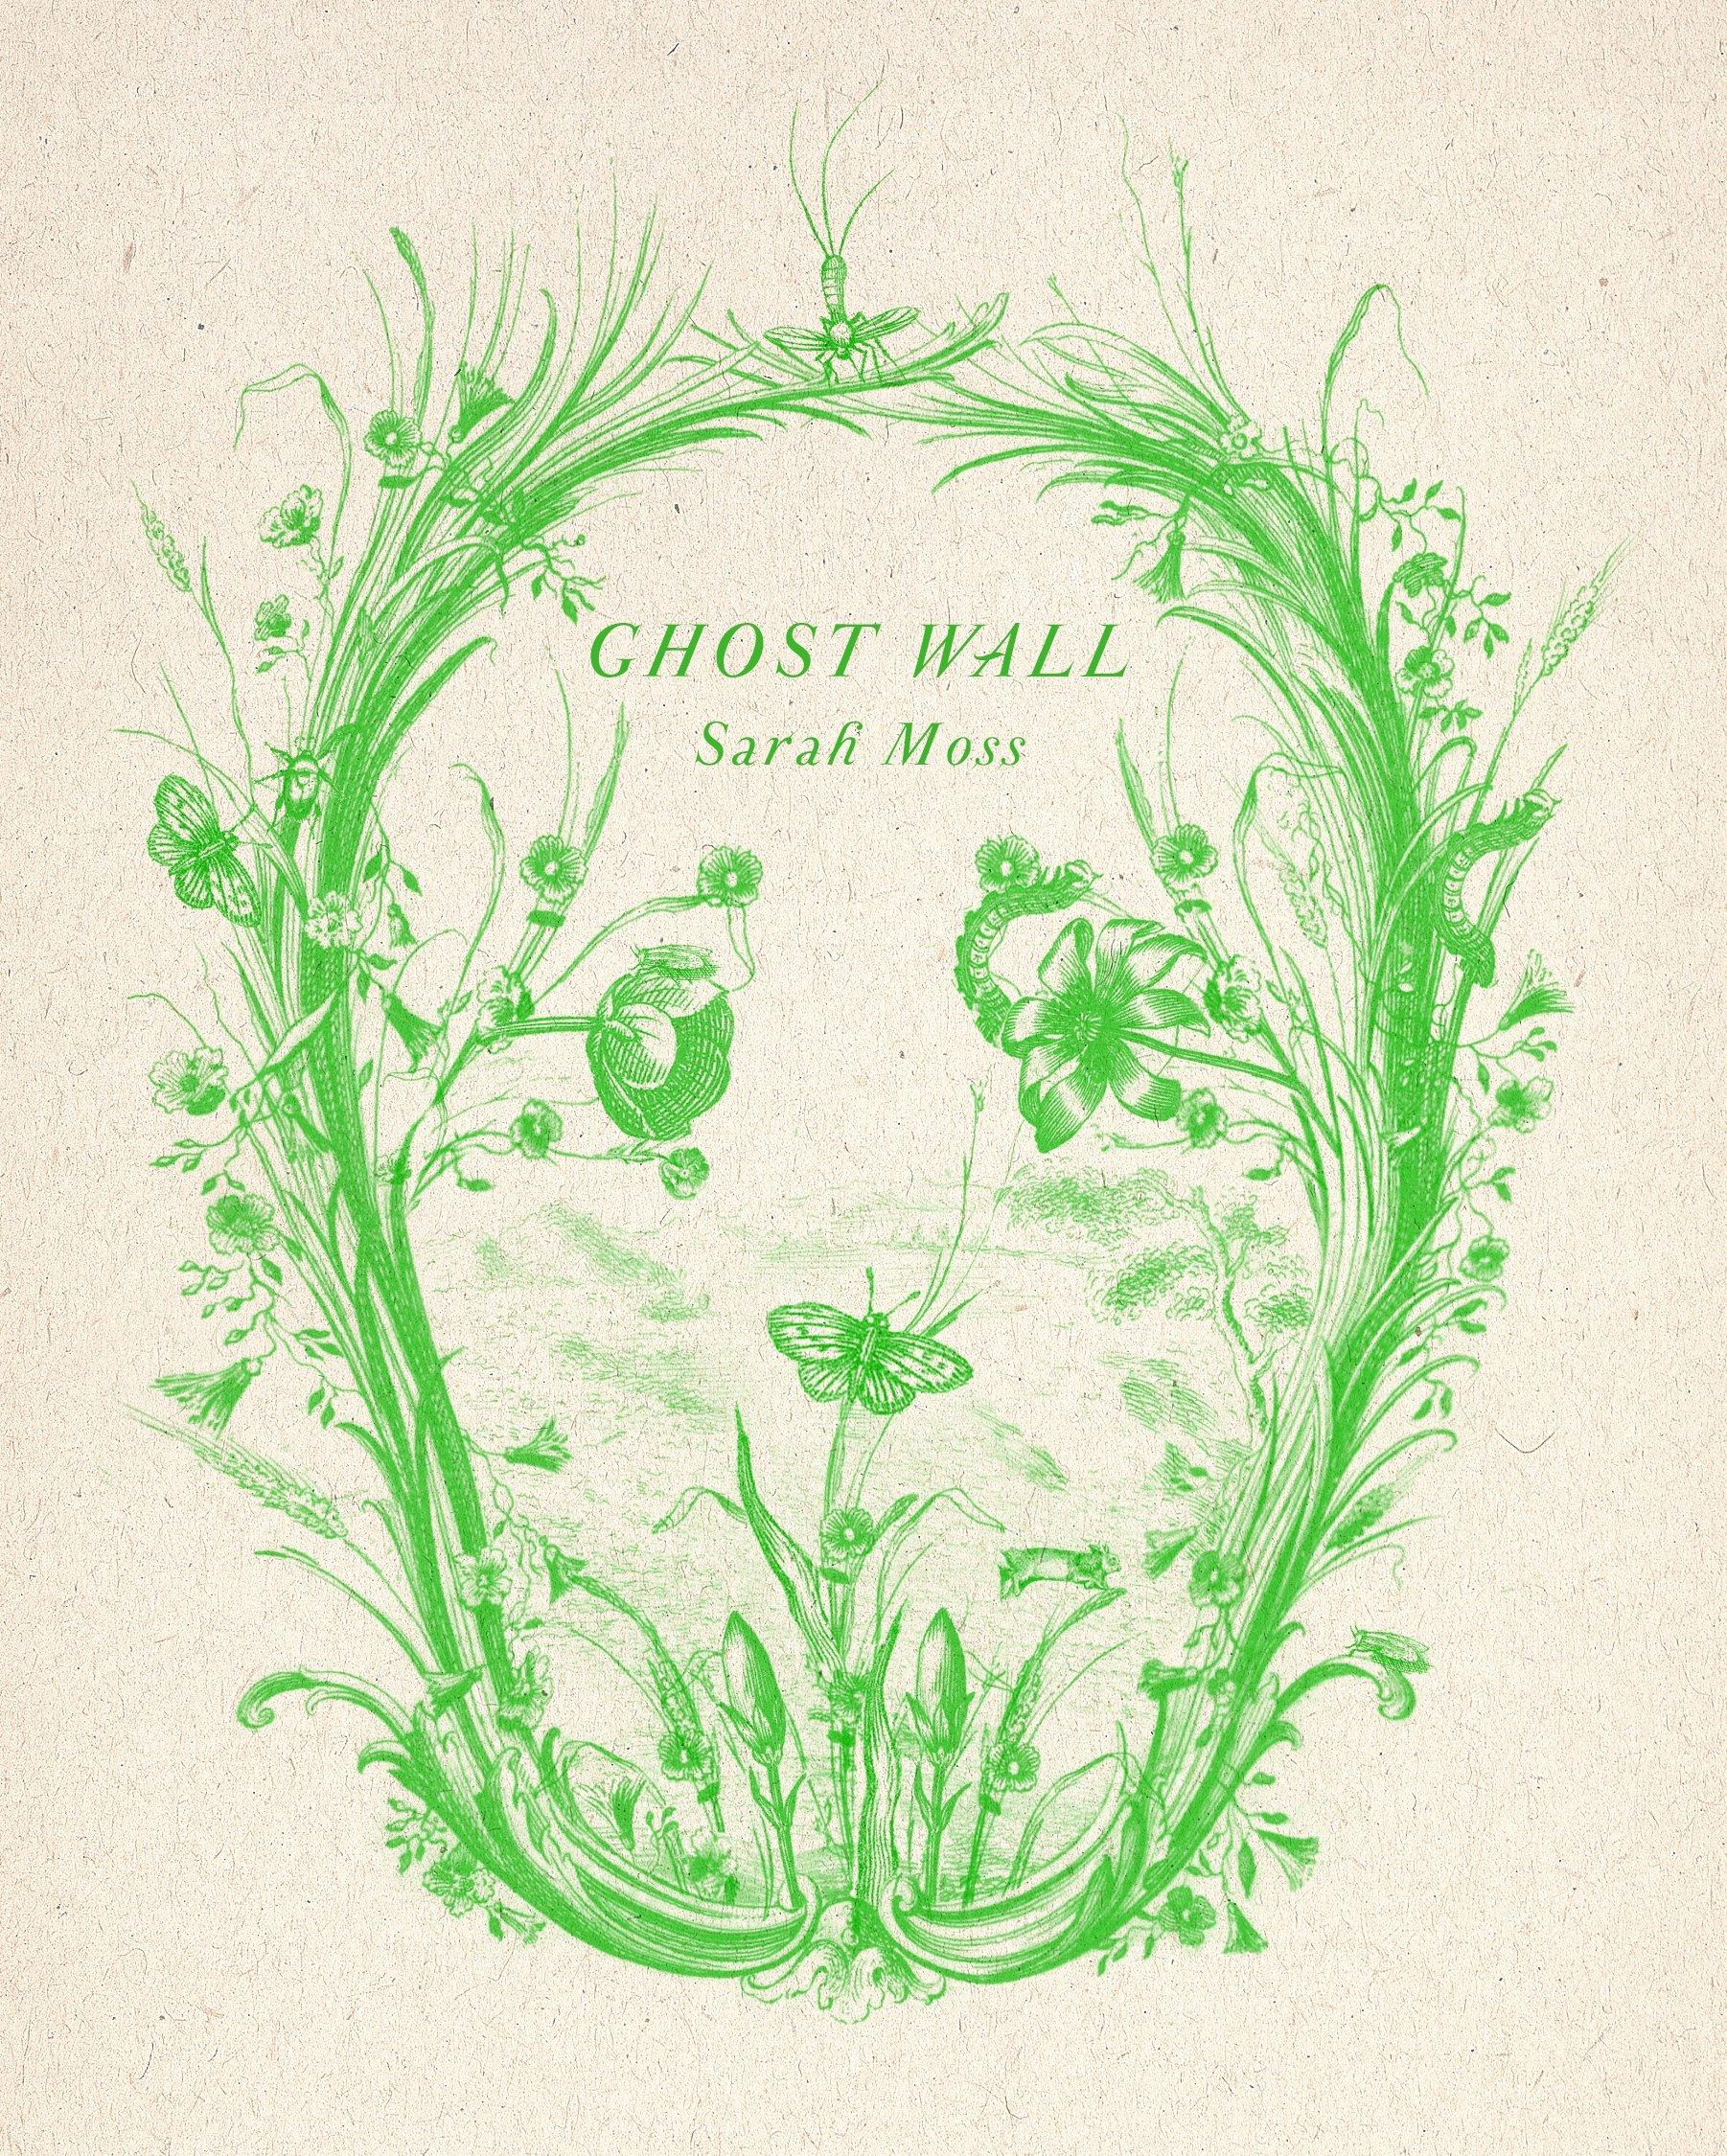 Amazon.com: Ghost Wall: A Novel (9780374161927): Moss, Sarah: Books